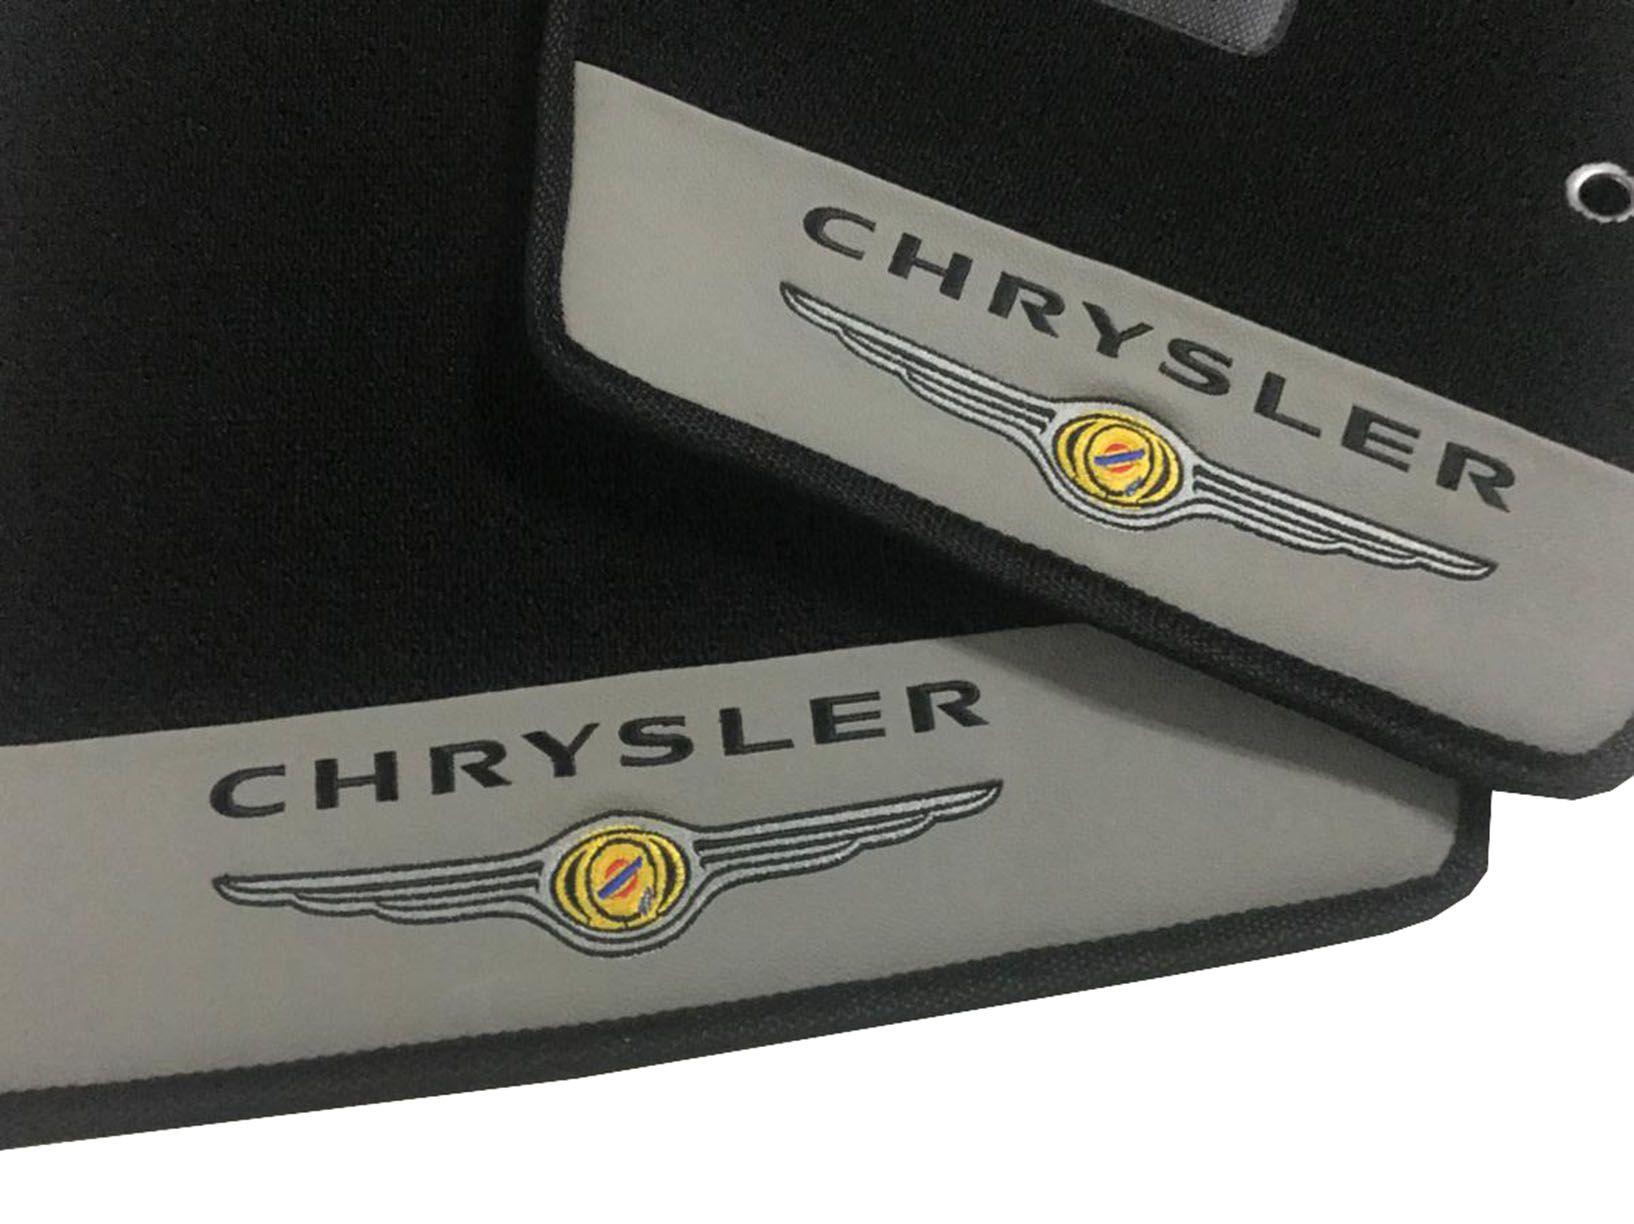 Tapete Carpete Chrysler Towny country 12mm Premium Original